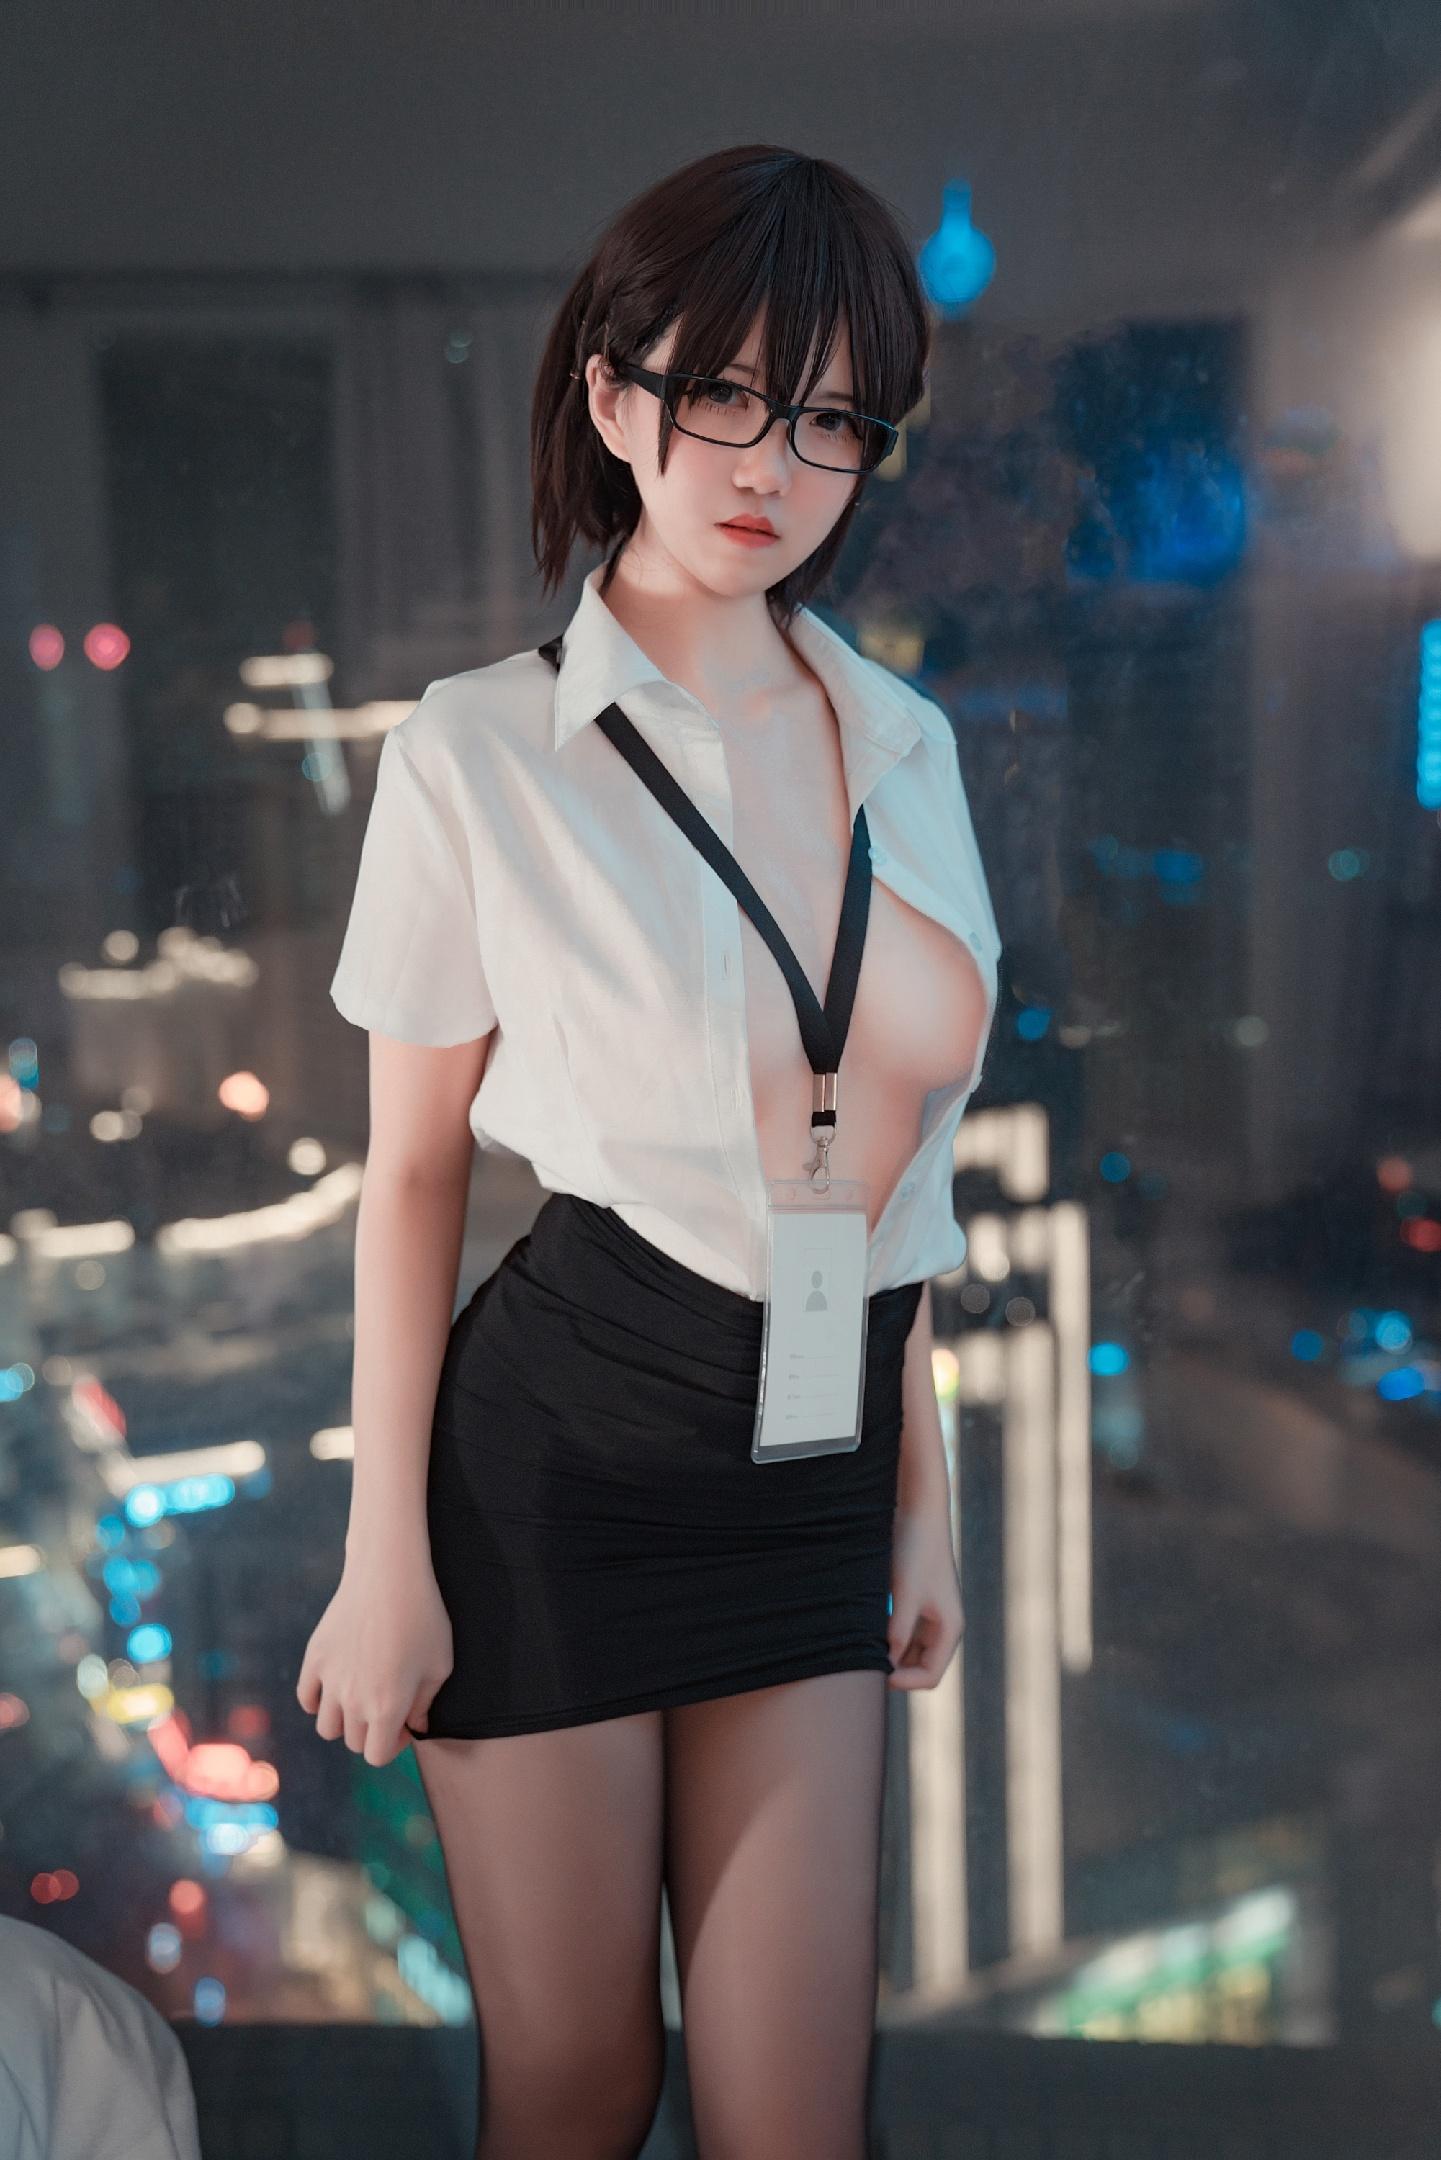 宅男咪zhainanmi.net; (38)